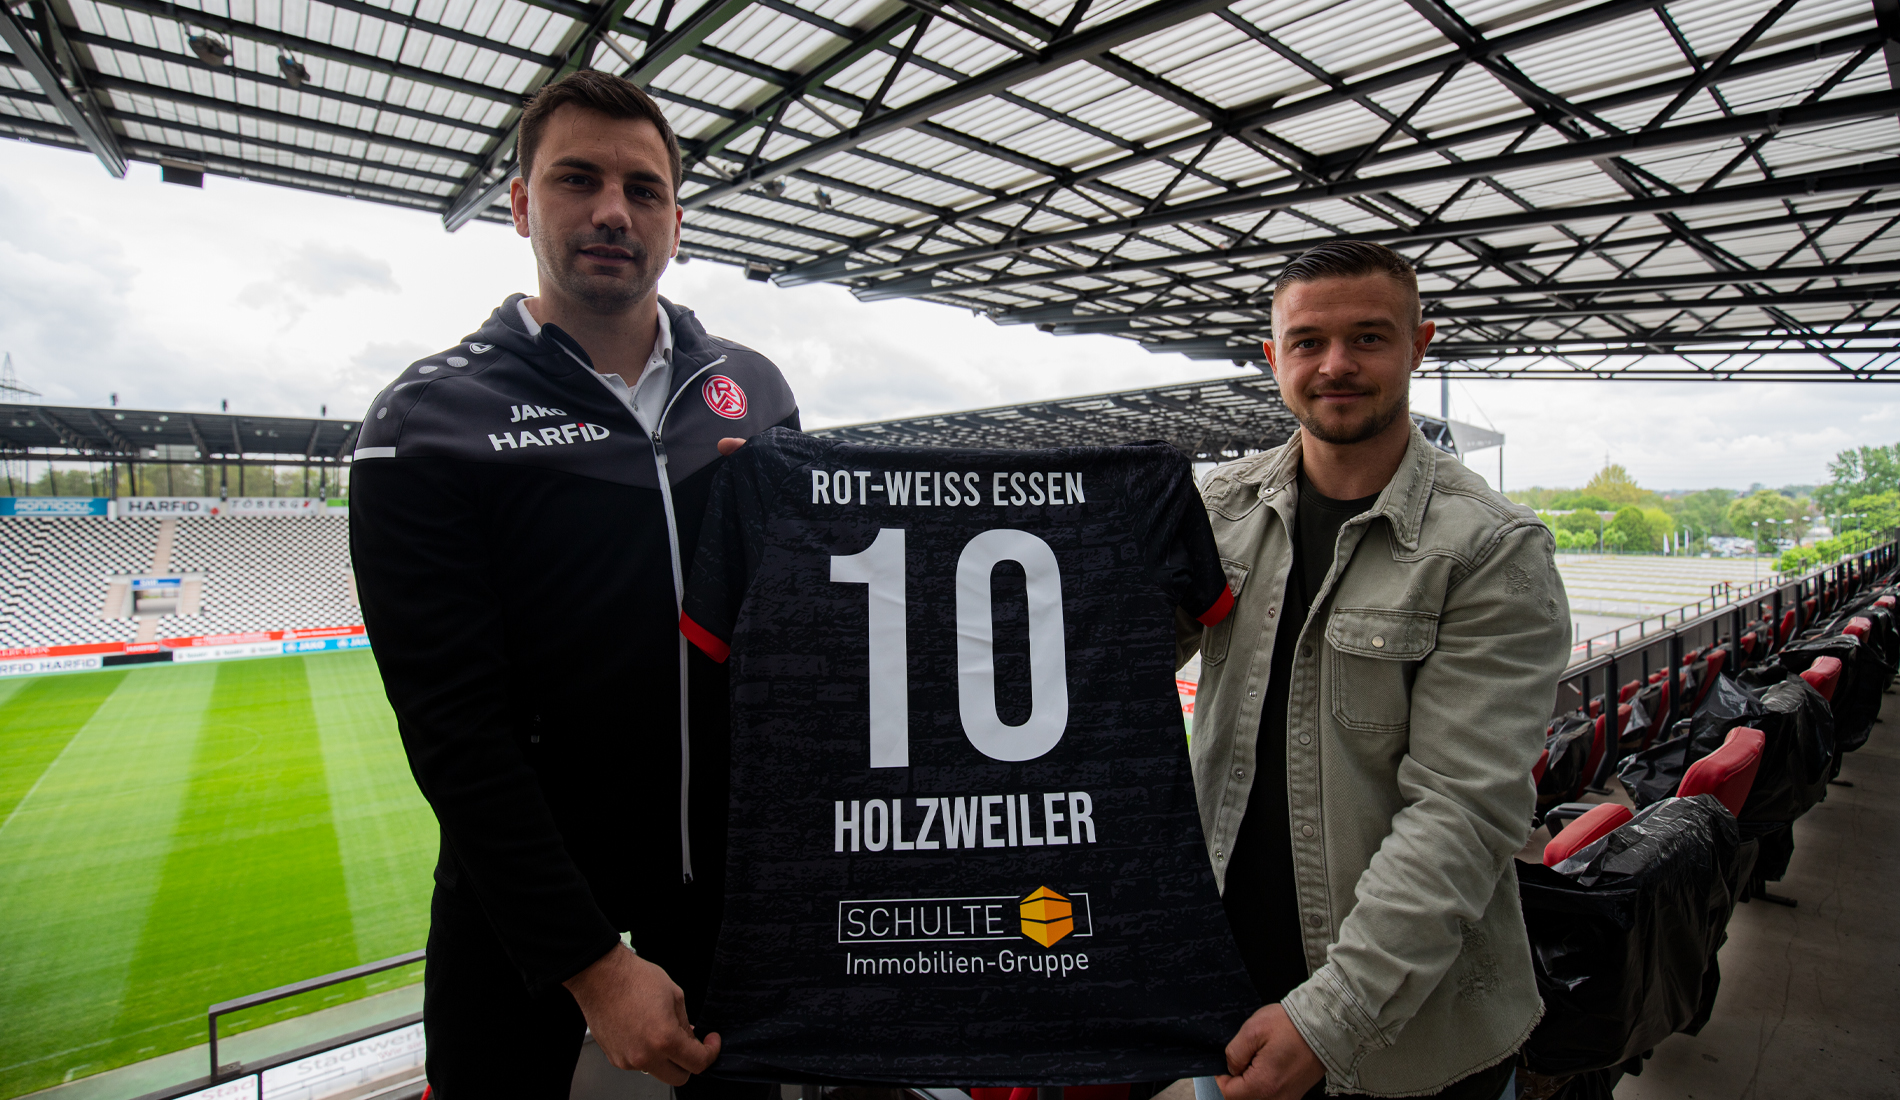 Kickt künftig in Rot-Weiss: Kevin Holzweiler (r.), hier mit RWE-Sportdirektor Jörn Nowak. (Foto: RWE)